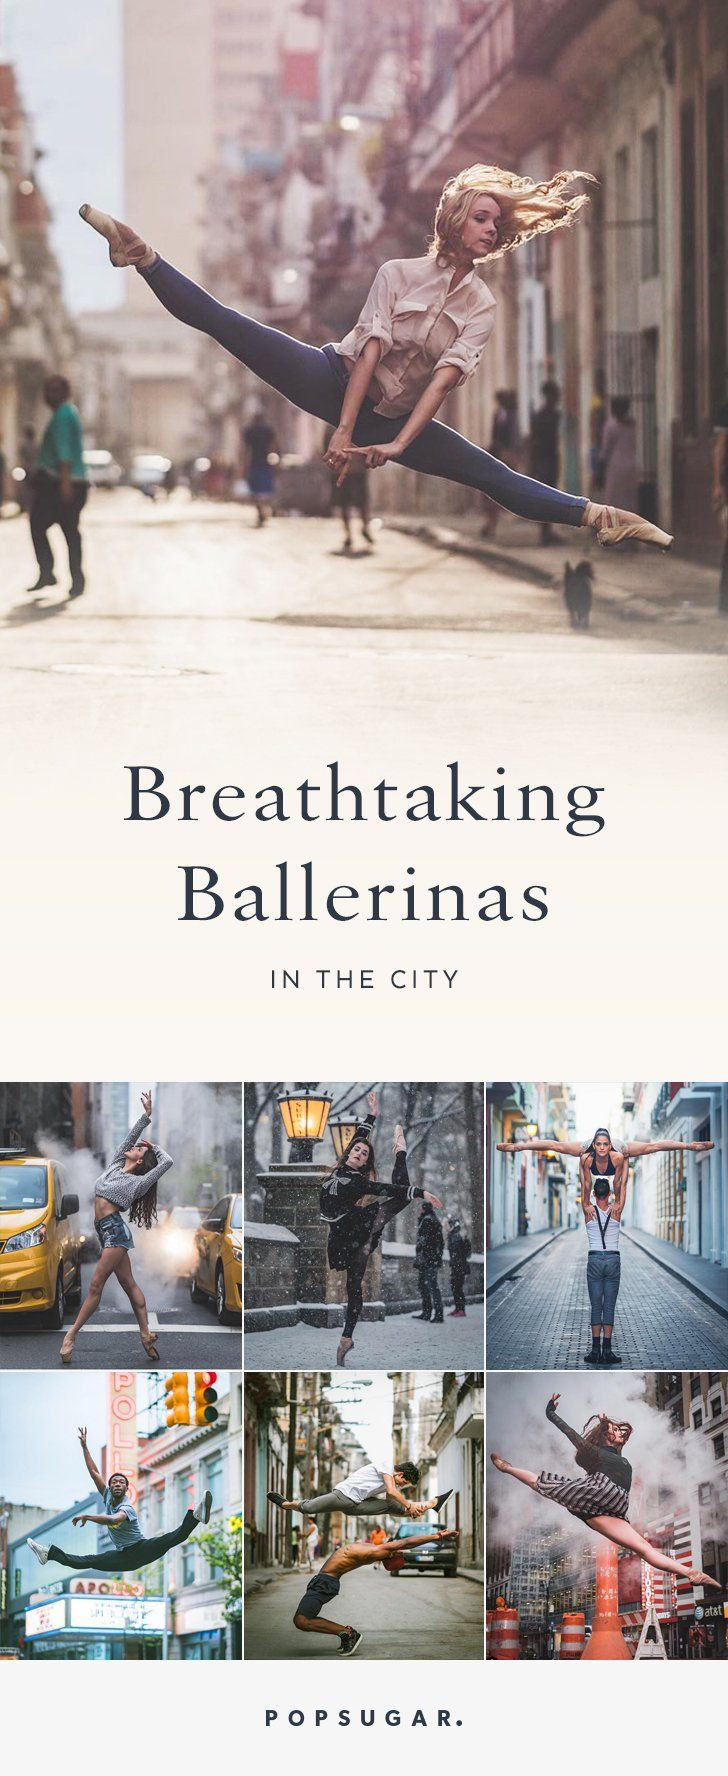 23 Breathtaking Shots of Ballerinas Against City Backdrops